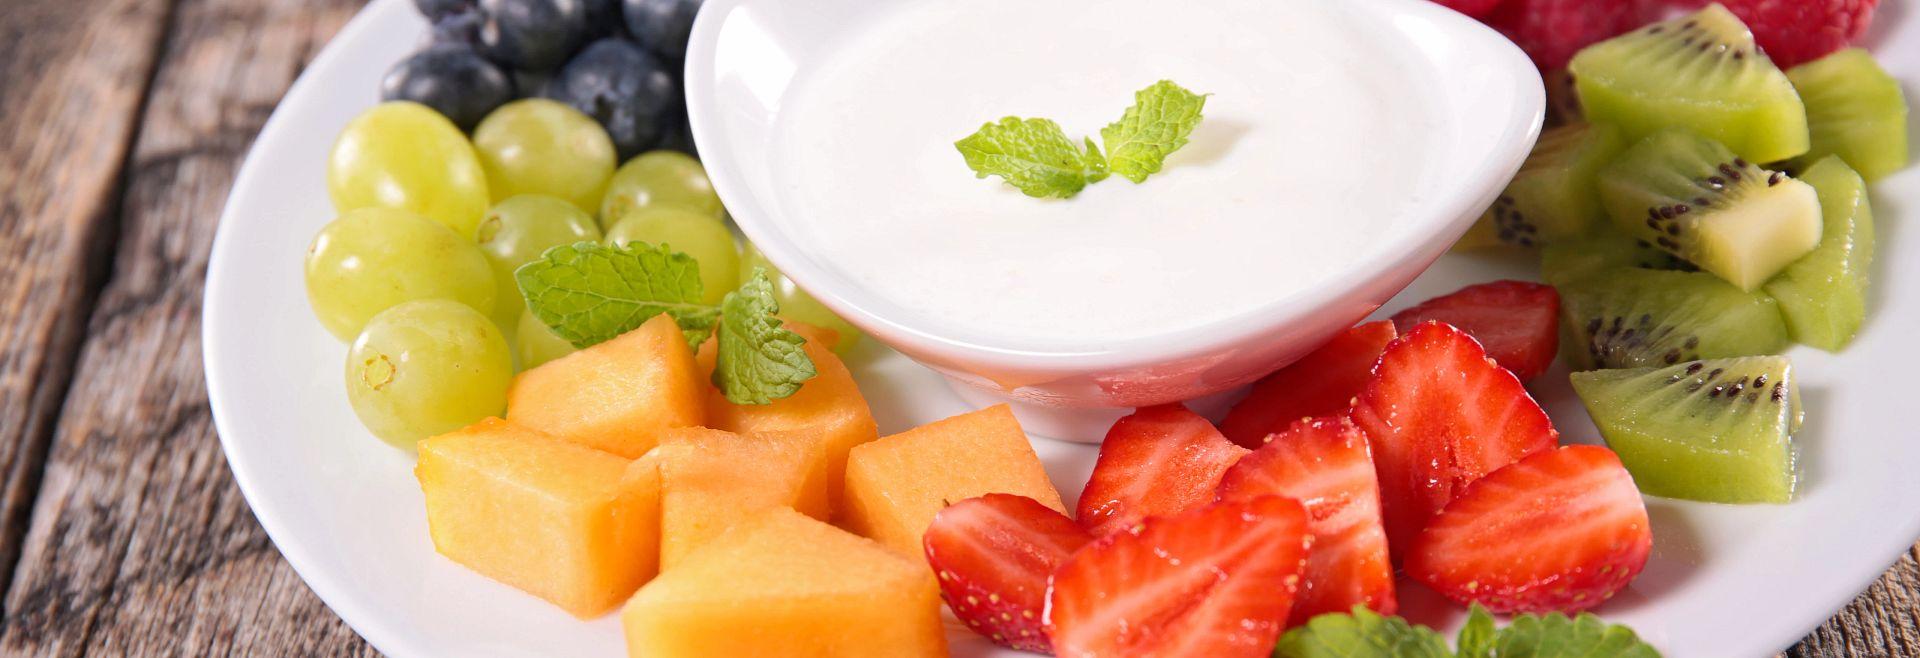 Fruit Yogurt Cream Getty Images